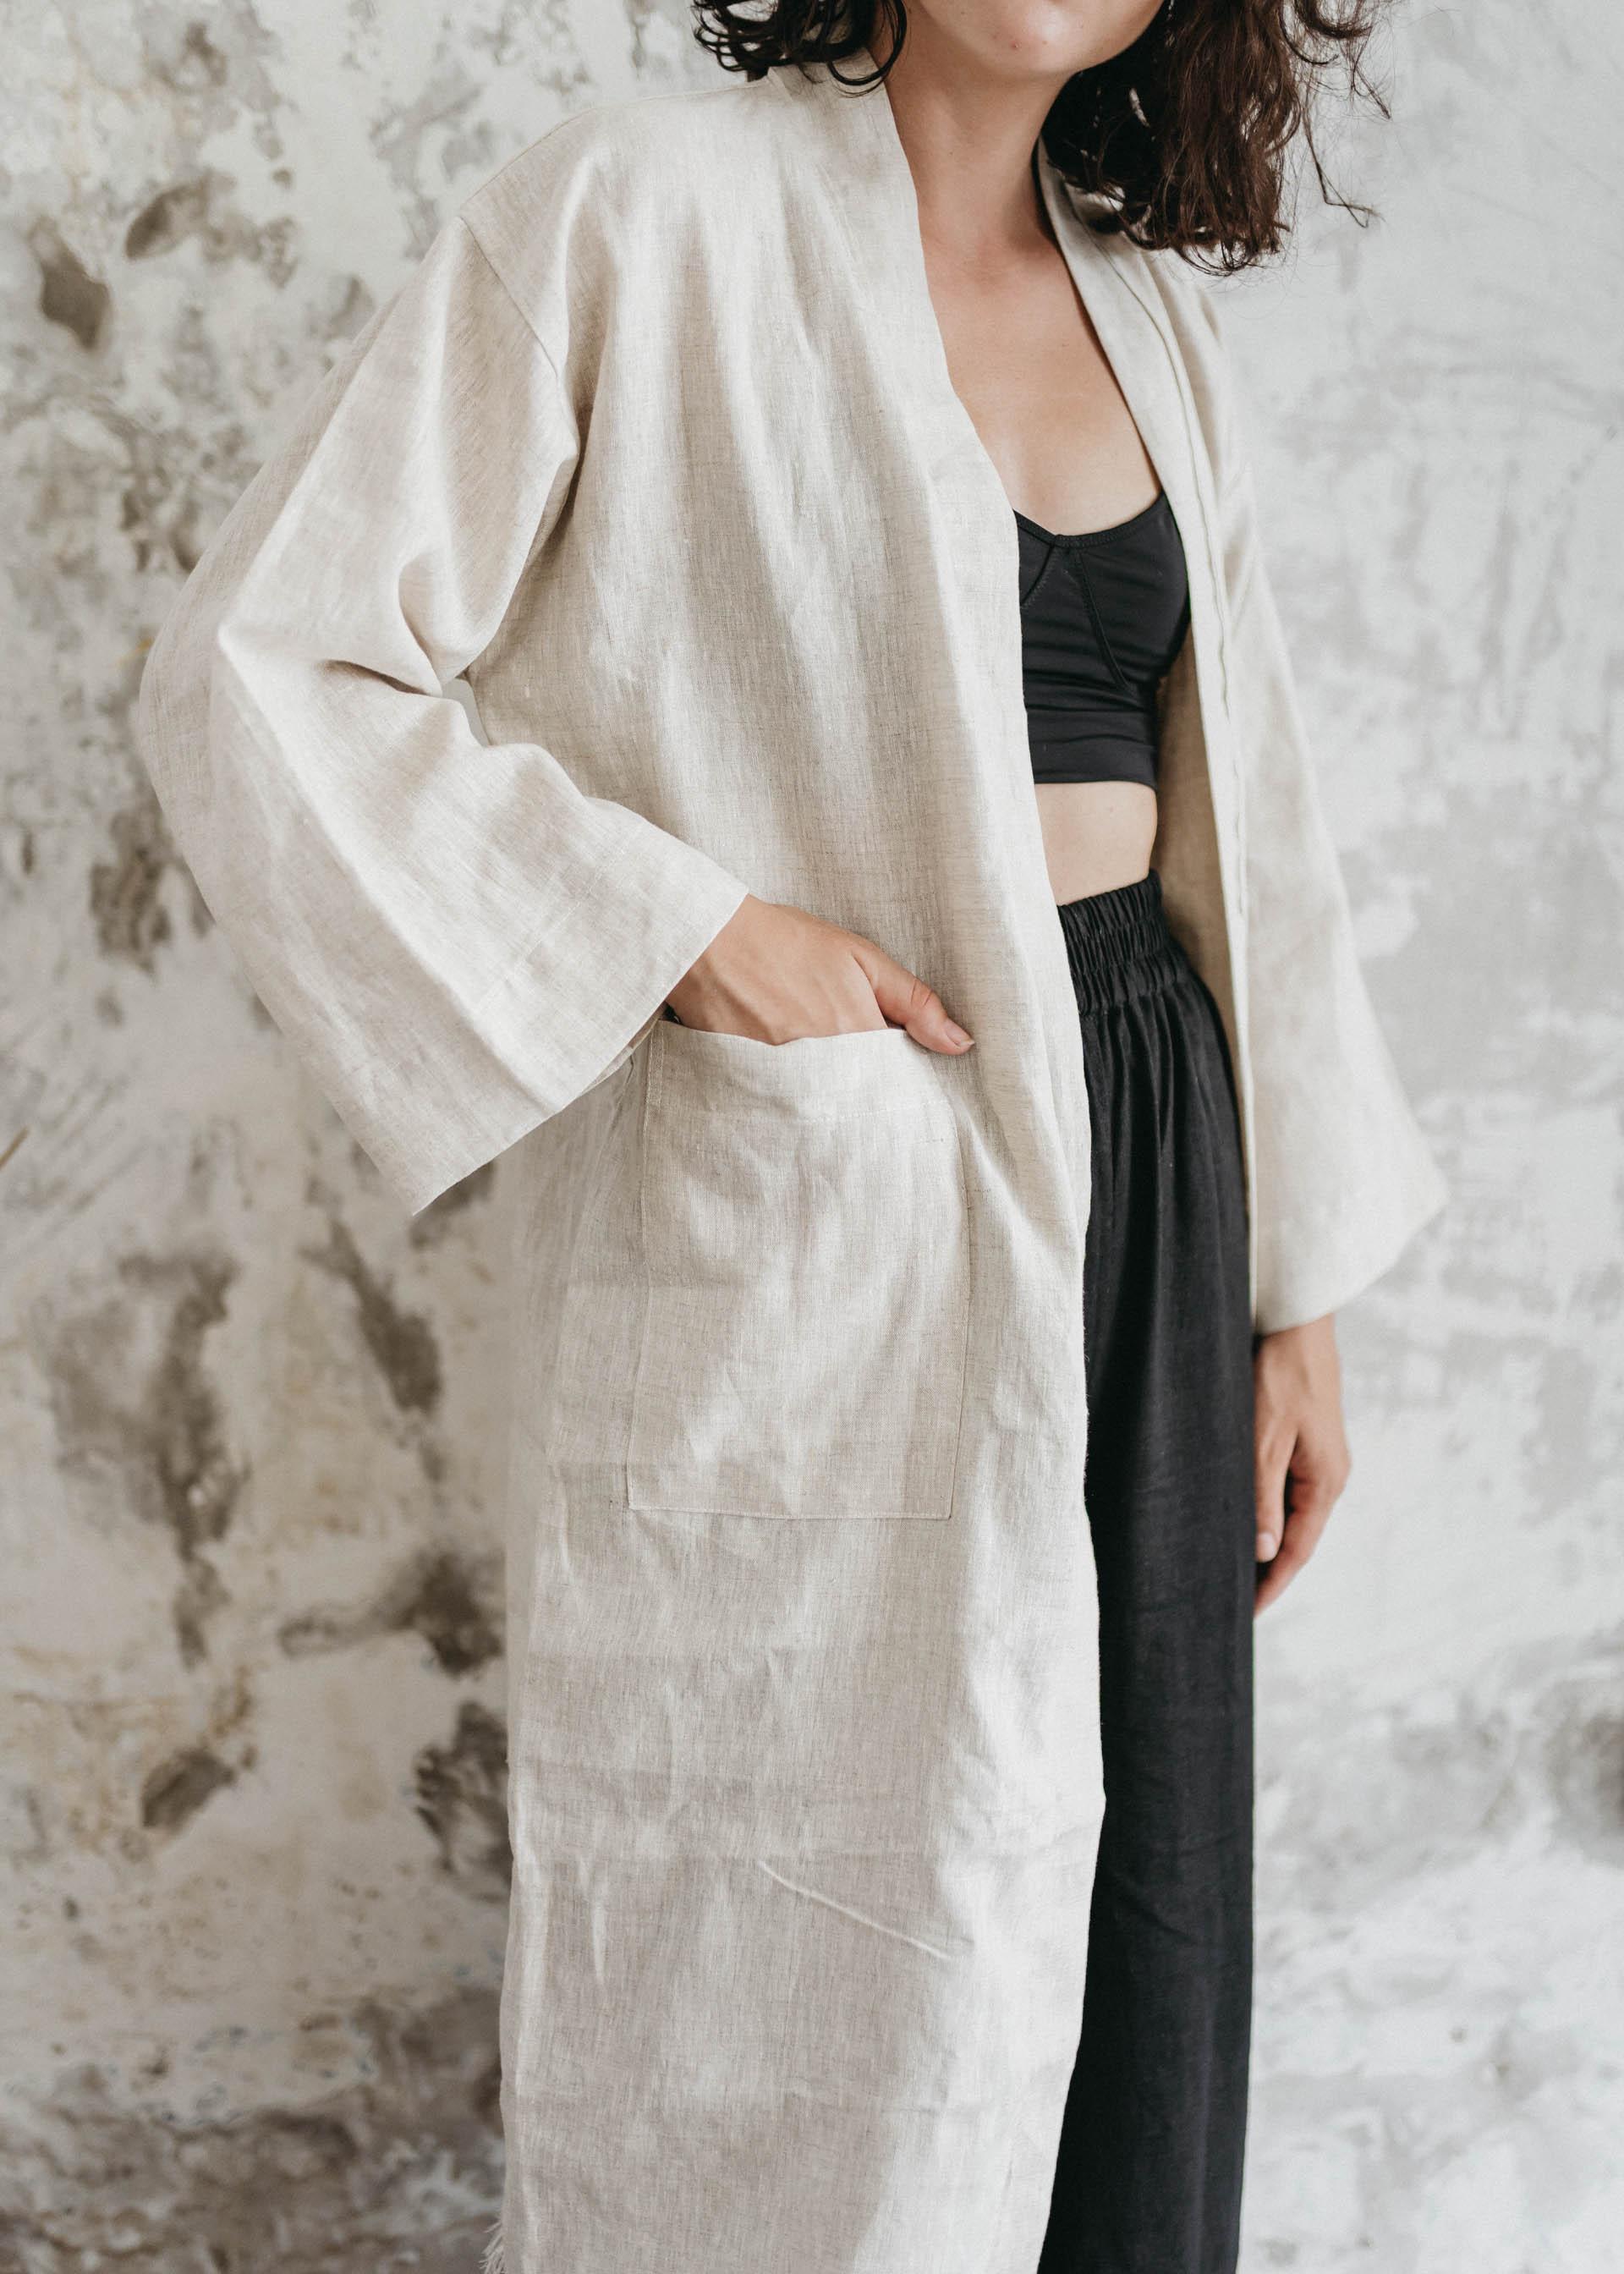 keira-mason-studio-karma-robe-natural-linen.jpg